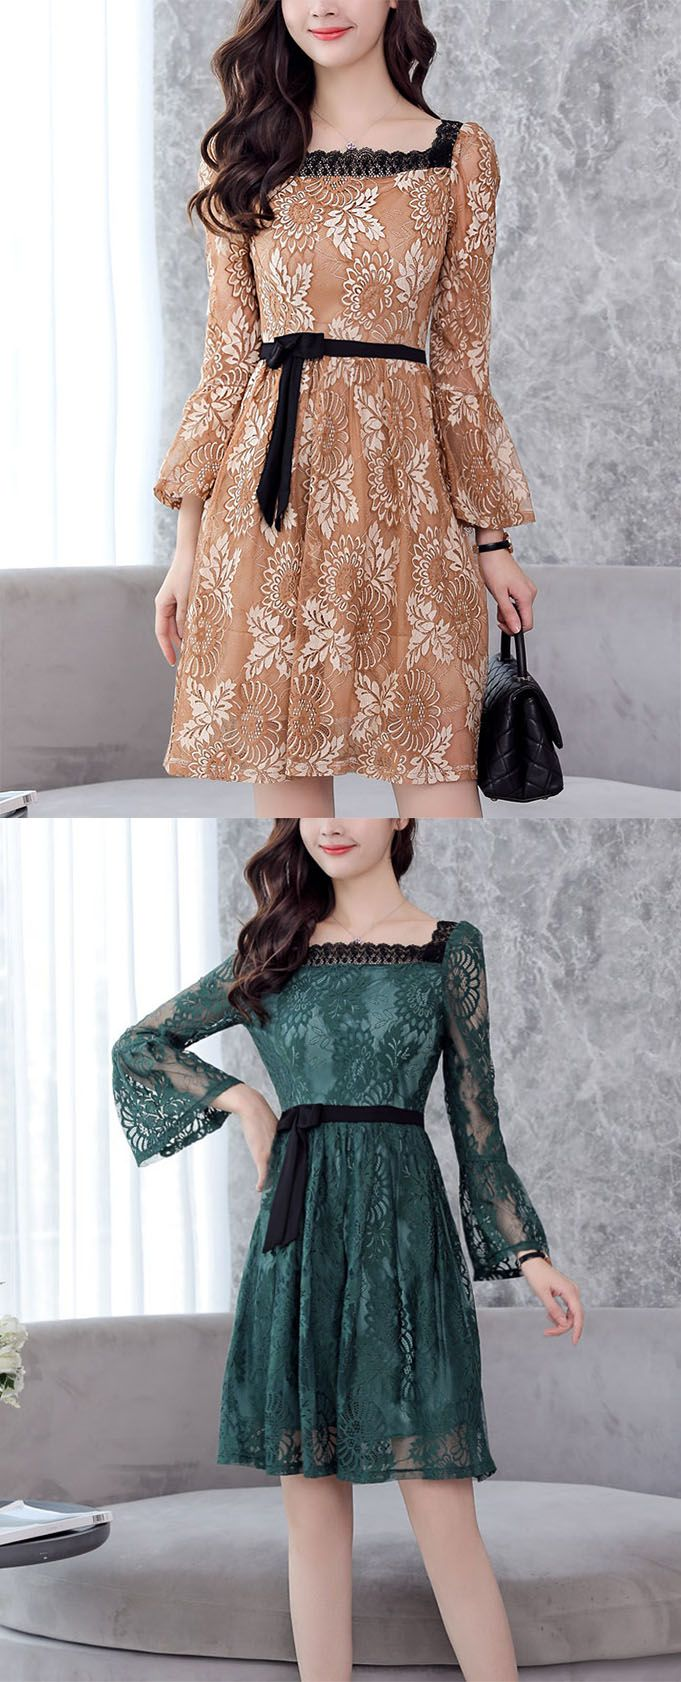 Women's Daily Street chic Lace Dress